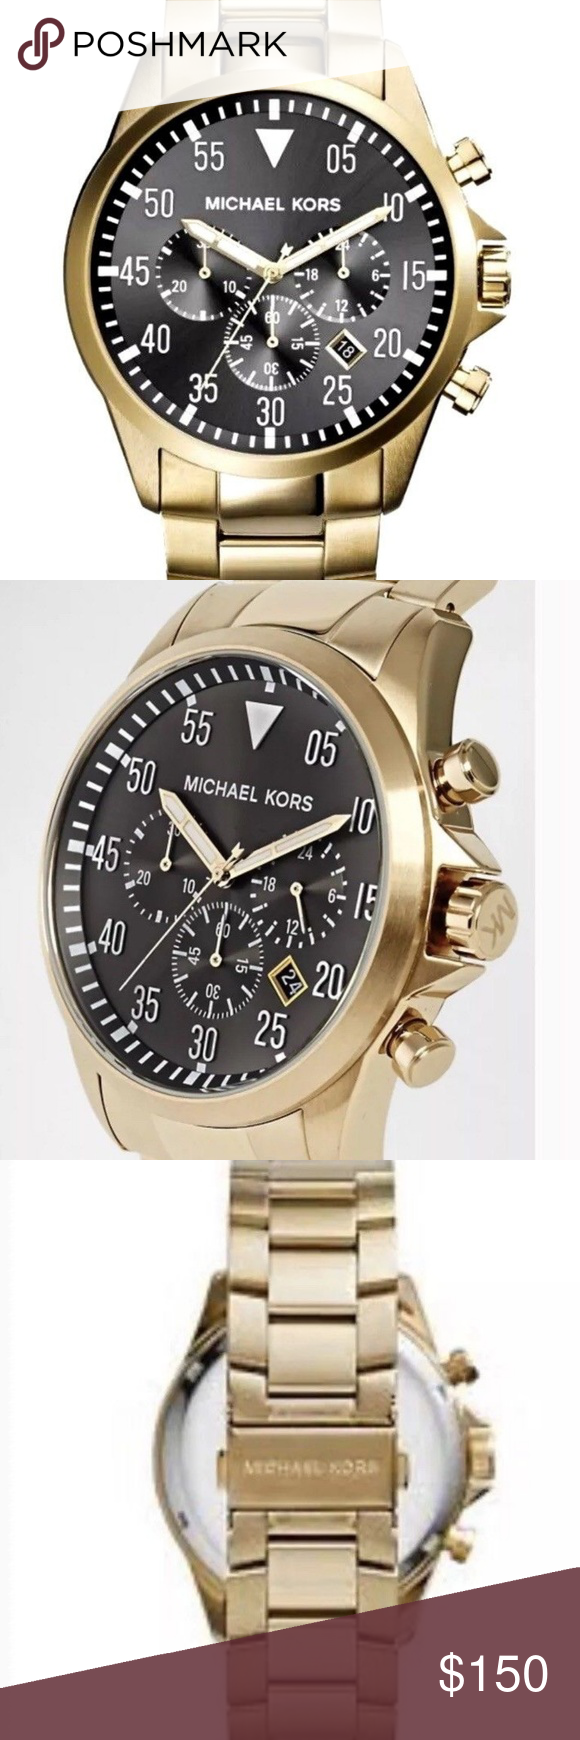 584f60d03a8f Michael Kors MK8361 Gage Chronograph Men s Watch Authentic Michael Kors  MK8361 Gage Chronograph Men s Watch Black Dial Gold Tone NWT  275 Michael  Kors ...